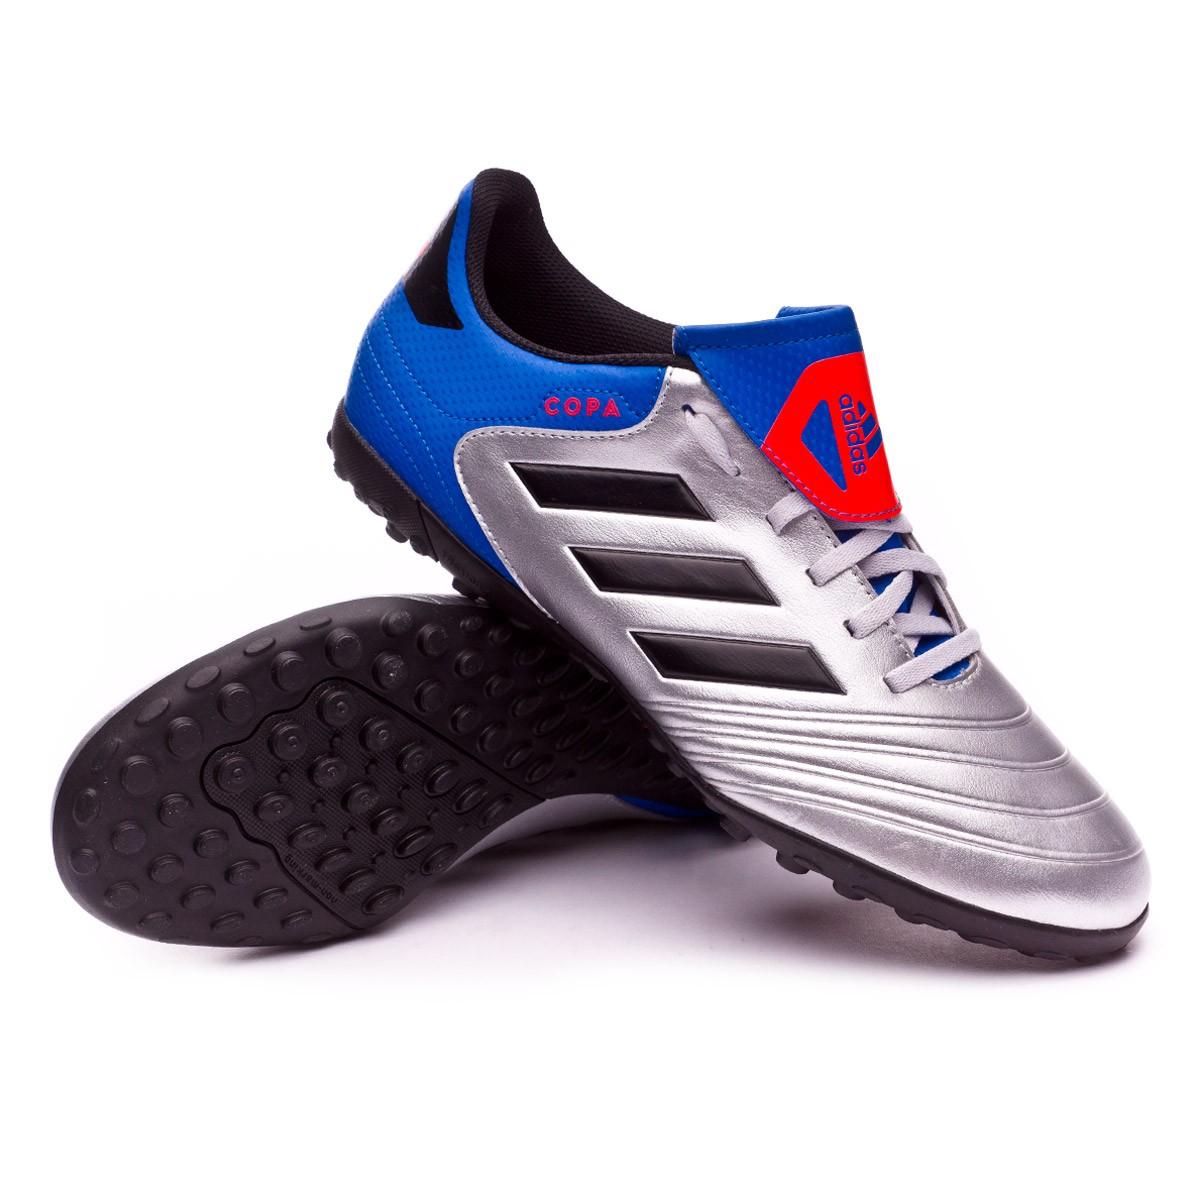 size 40 f5ebb 0f677 adidas Copa Tango 18.4 Turf Football Boot. Silver metallic-Core black-Football  blue ...